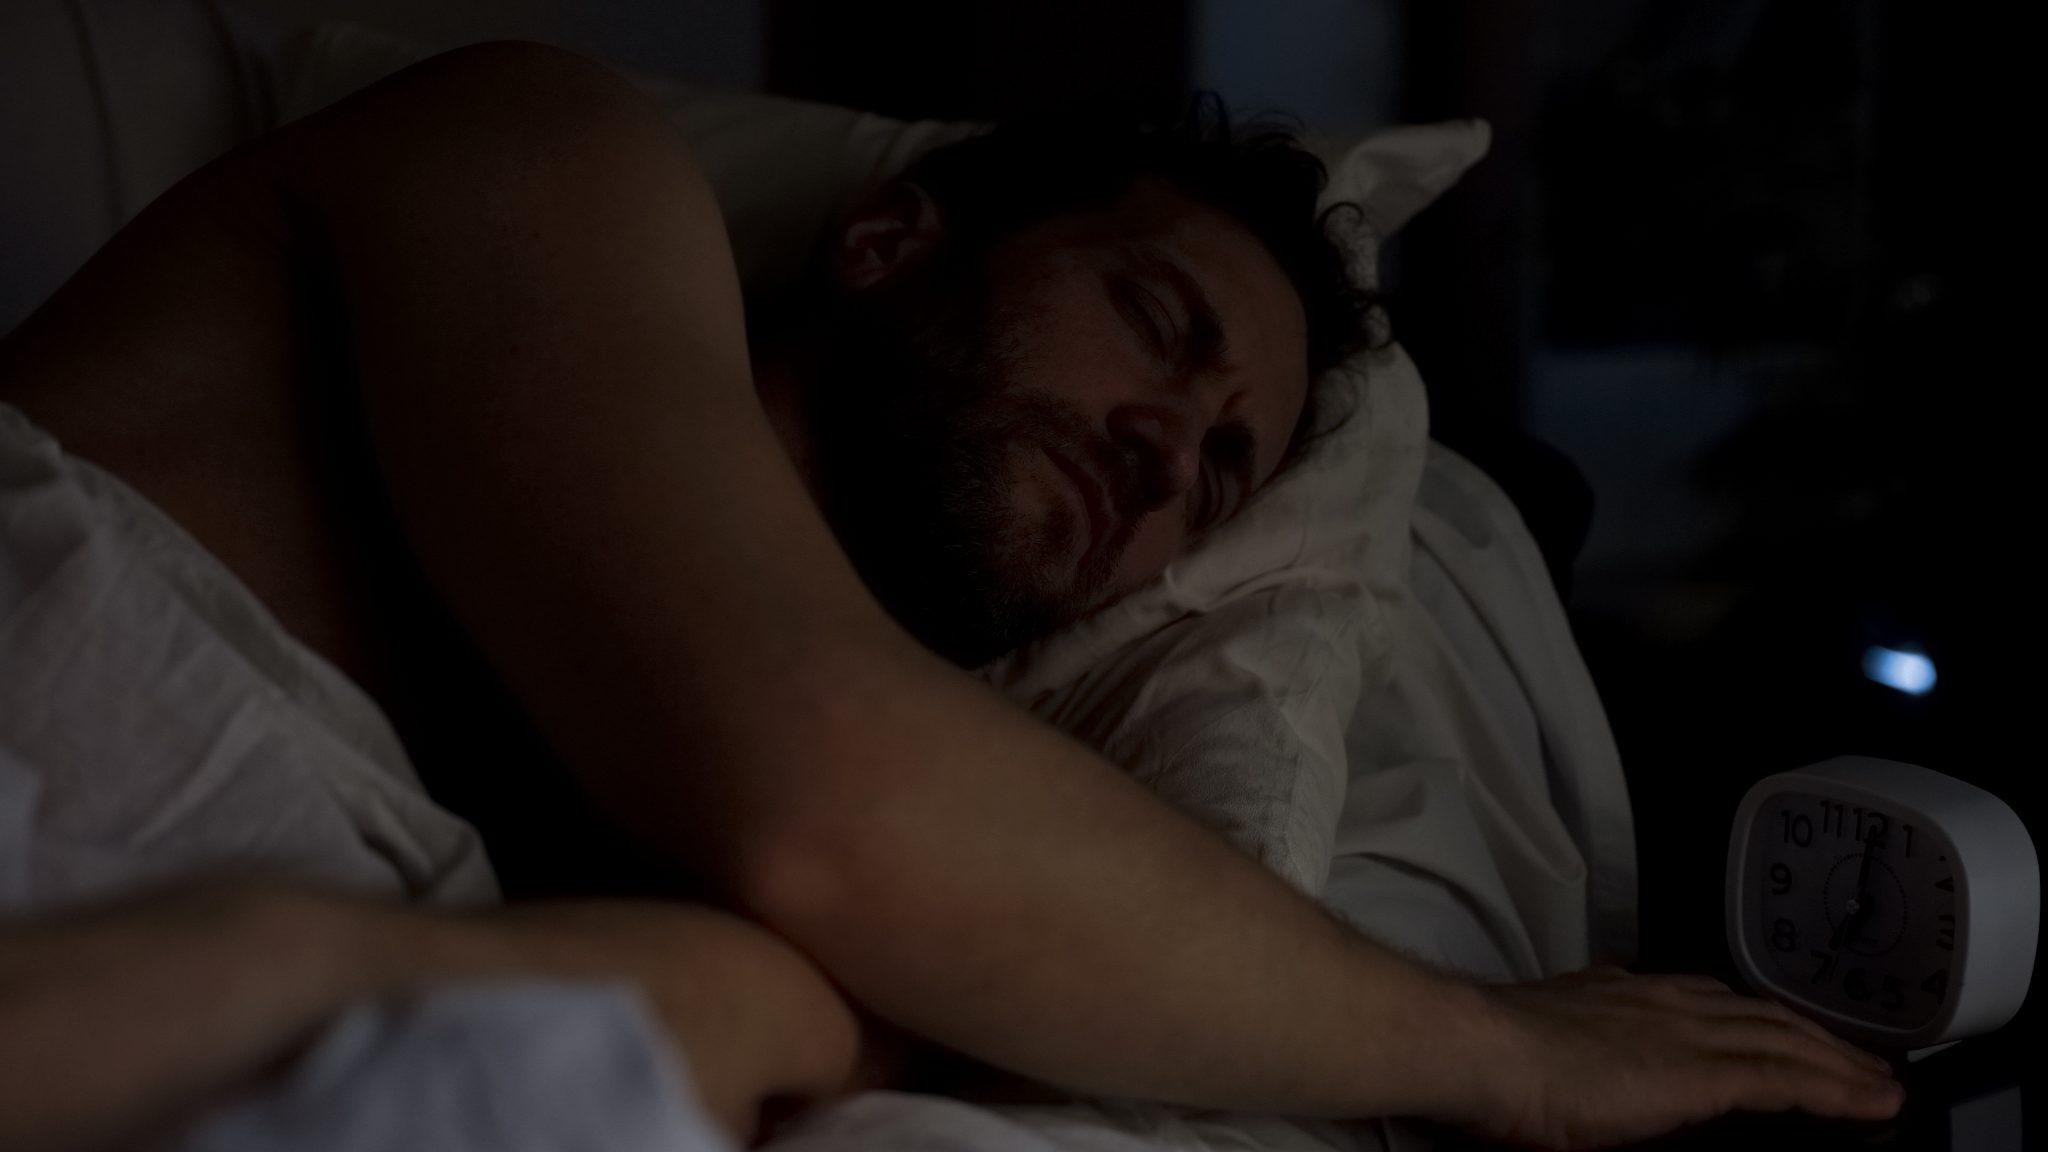 Sleeping man in a dark room